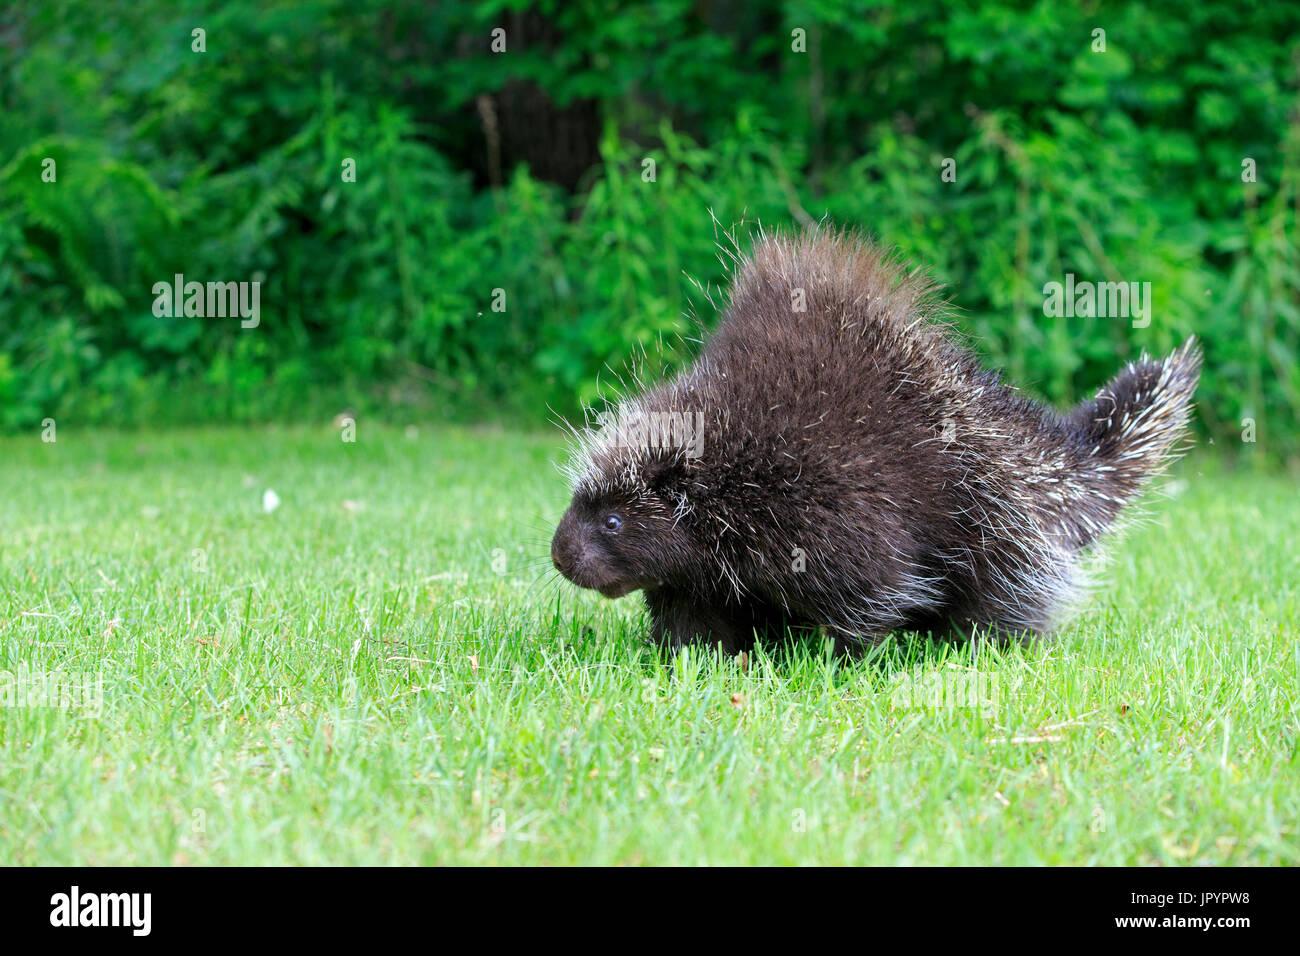 North American porcupine in grass - Minnesota USA Stock Photo